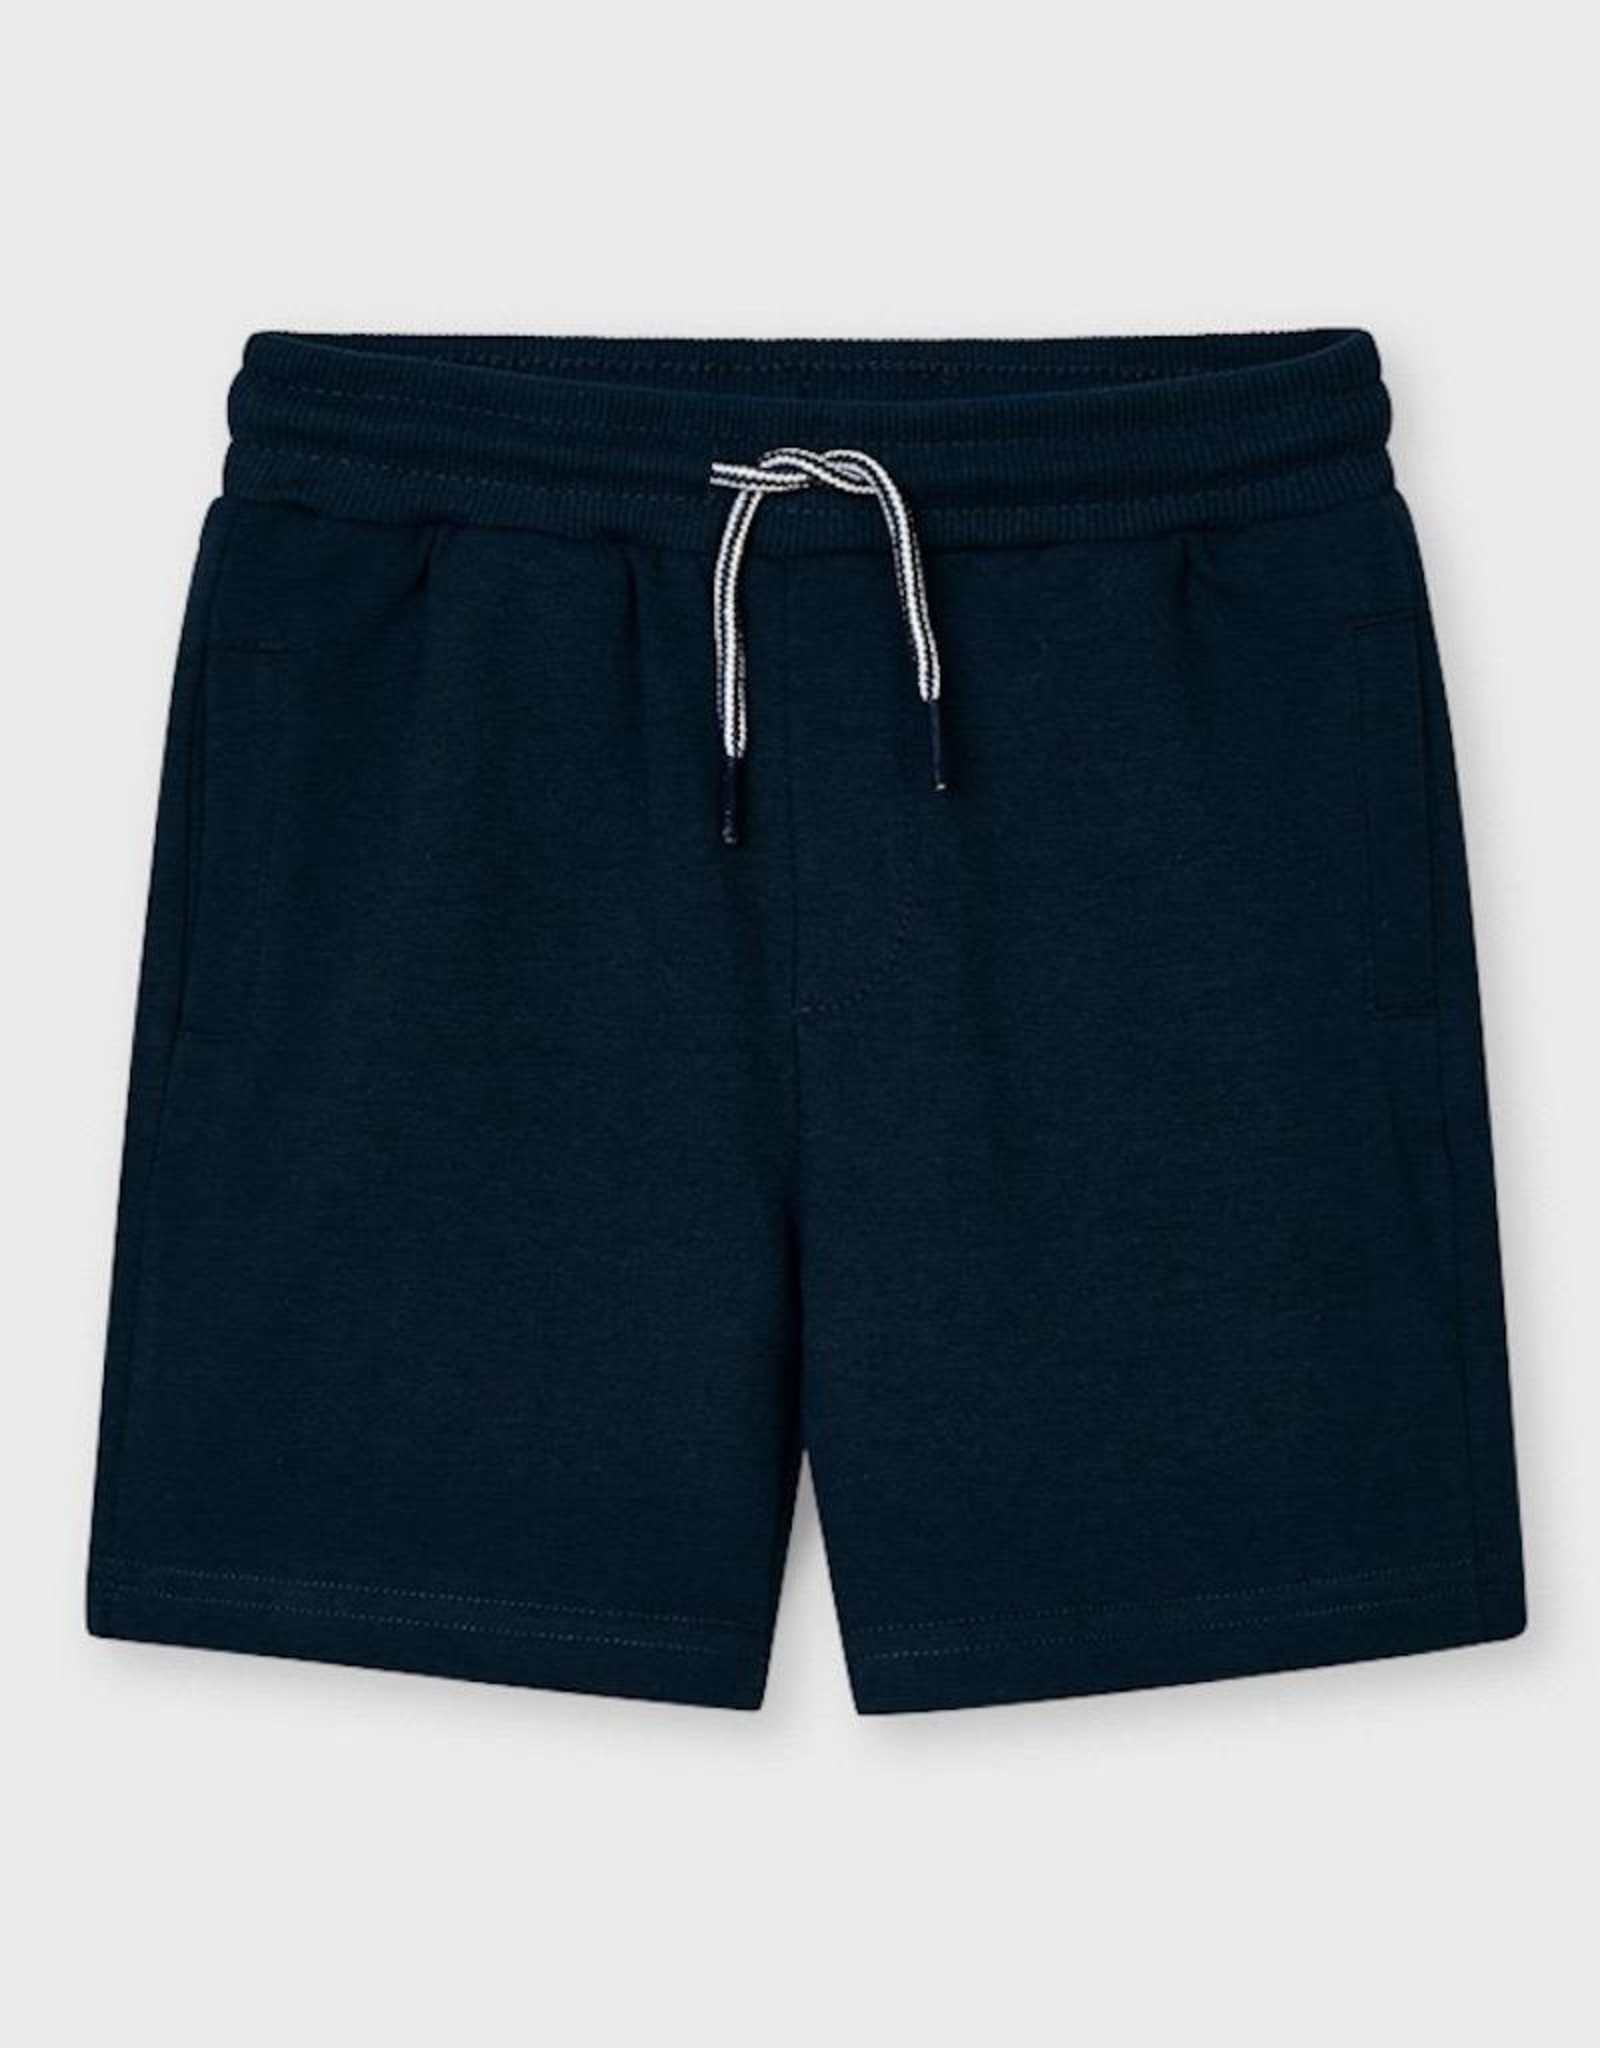 Mayoral Navy Blue Sporty Shorts